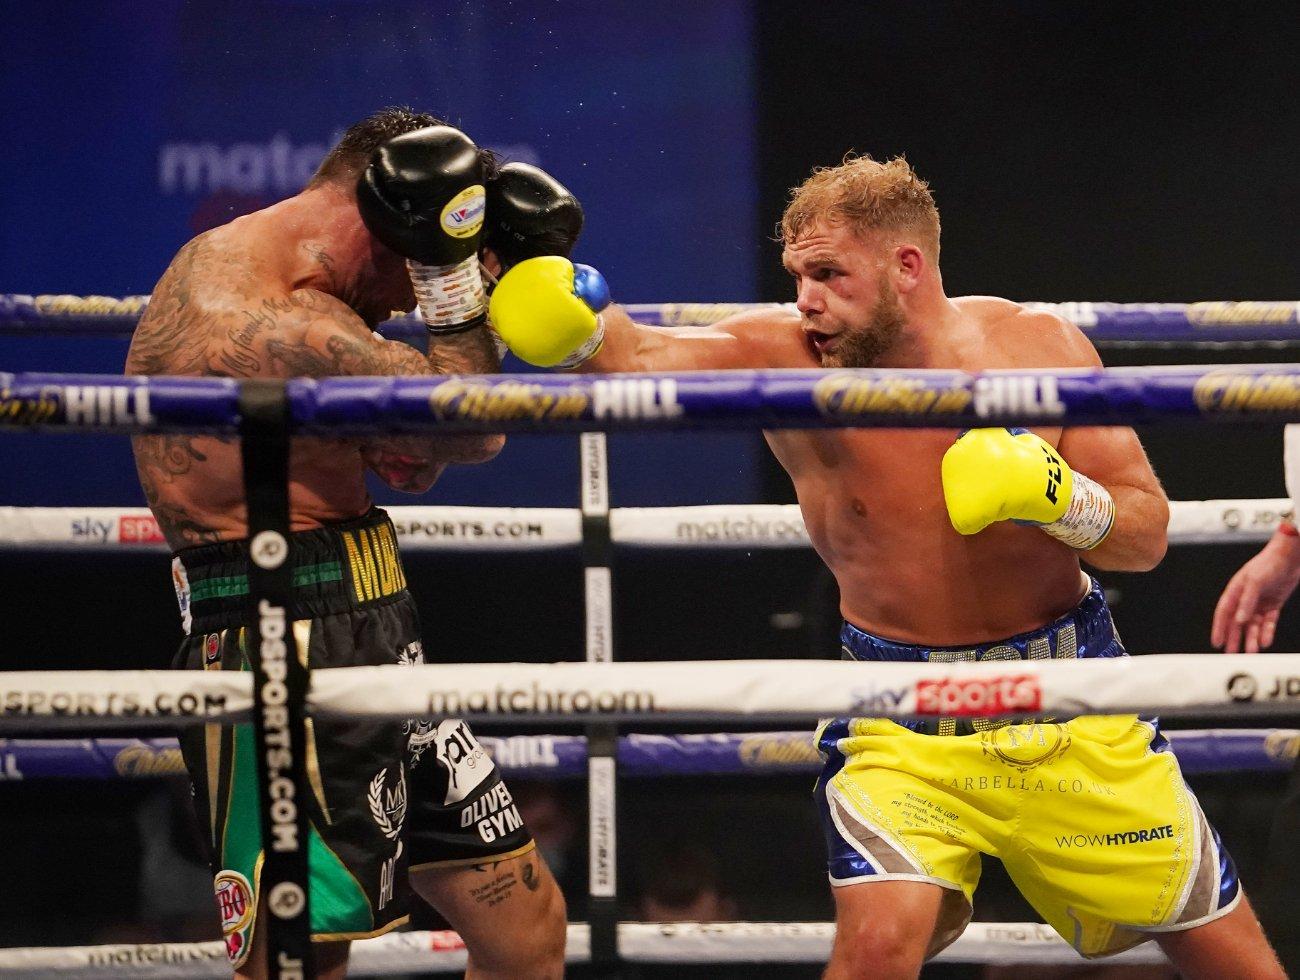 Billy Joe Saunders, Canelo Alvarez, Eddie Hearn - Boxing News